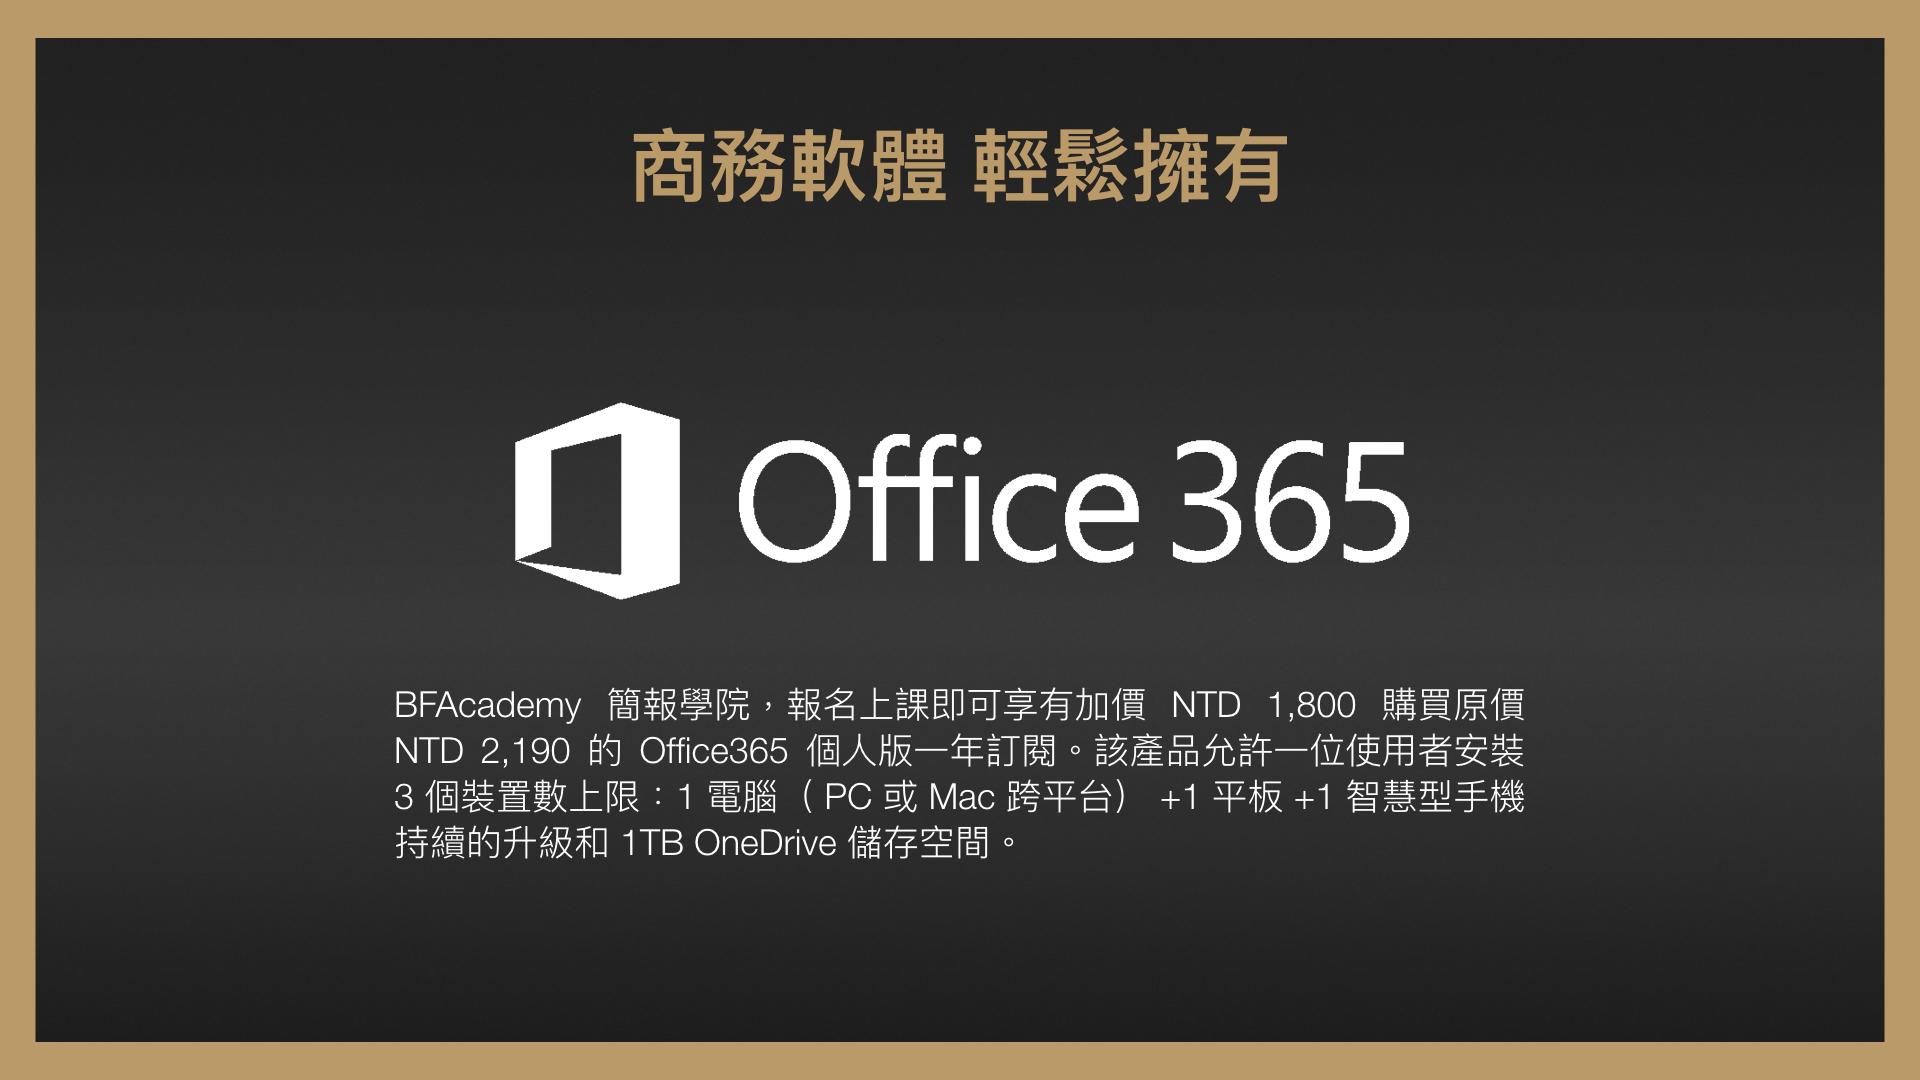 BFAcademy #5 林大班 周震宇.011.jpeg